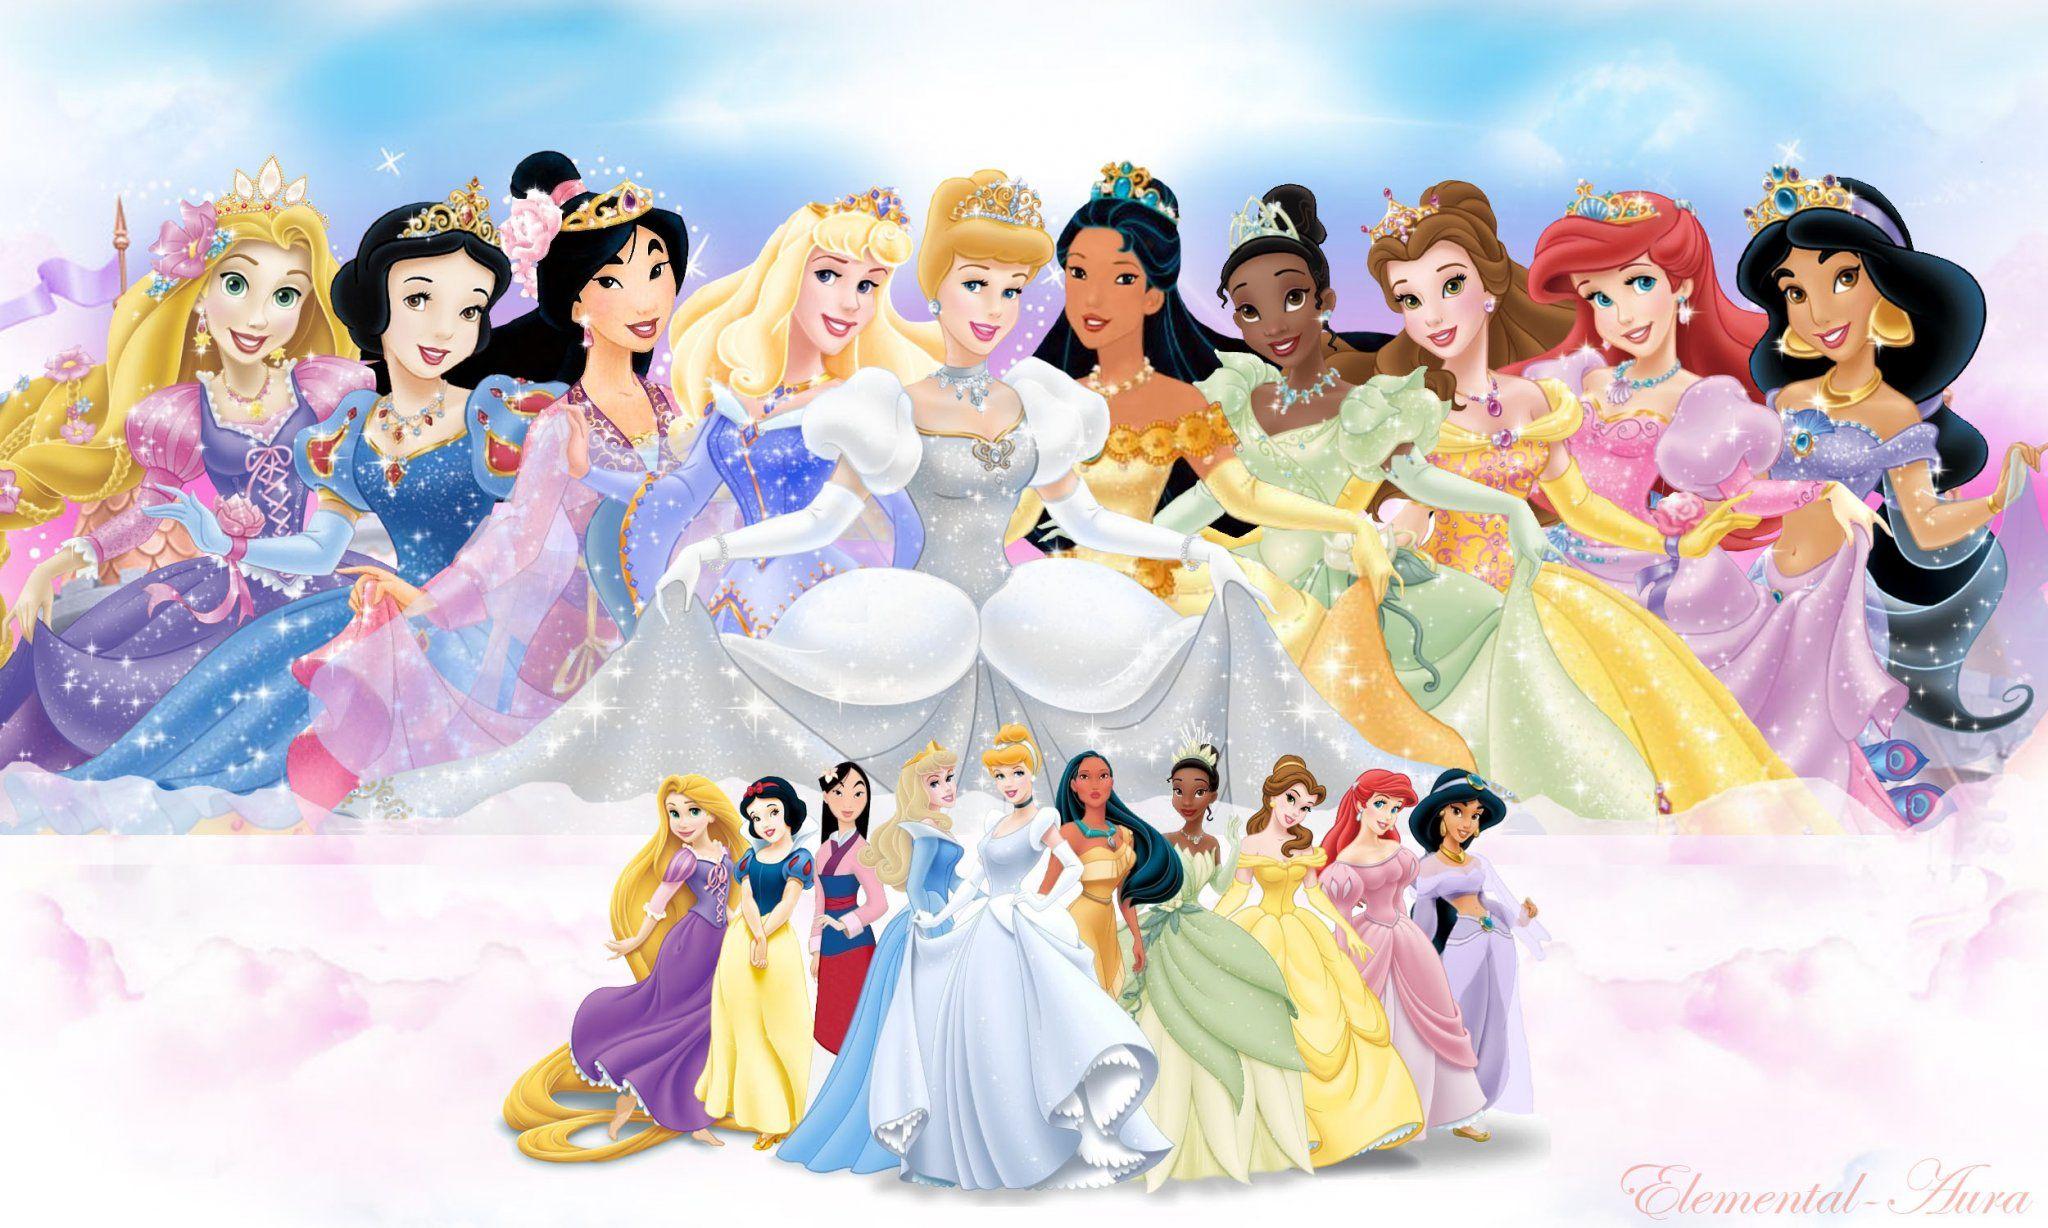 Princesas disney fondos disney princess wallpapers altavistaventures Choice Image